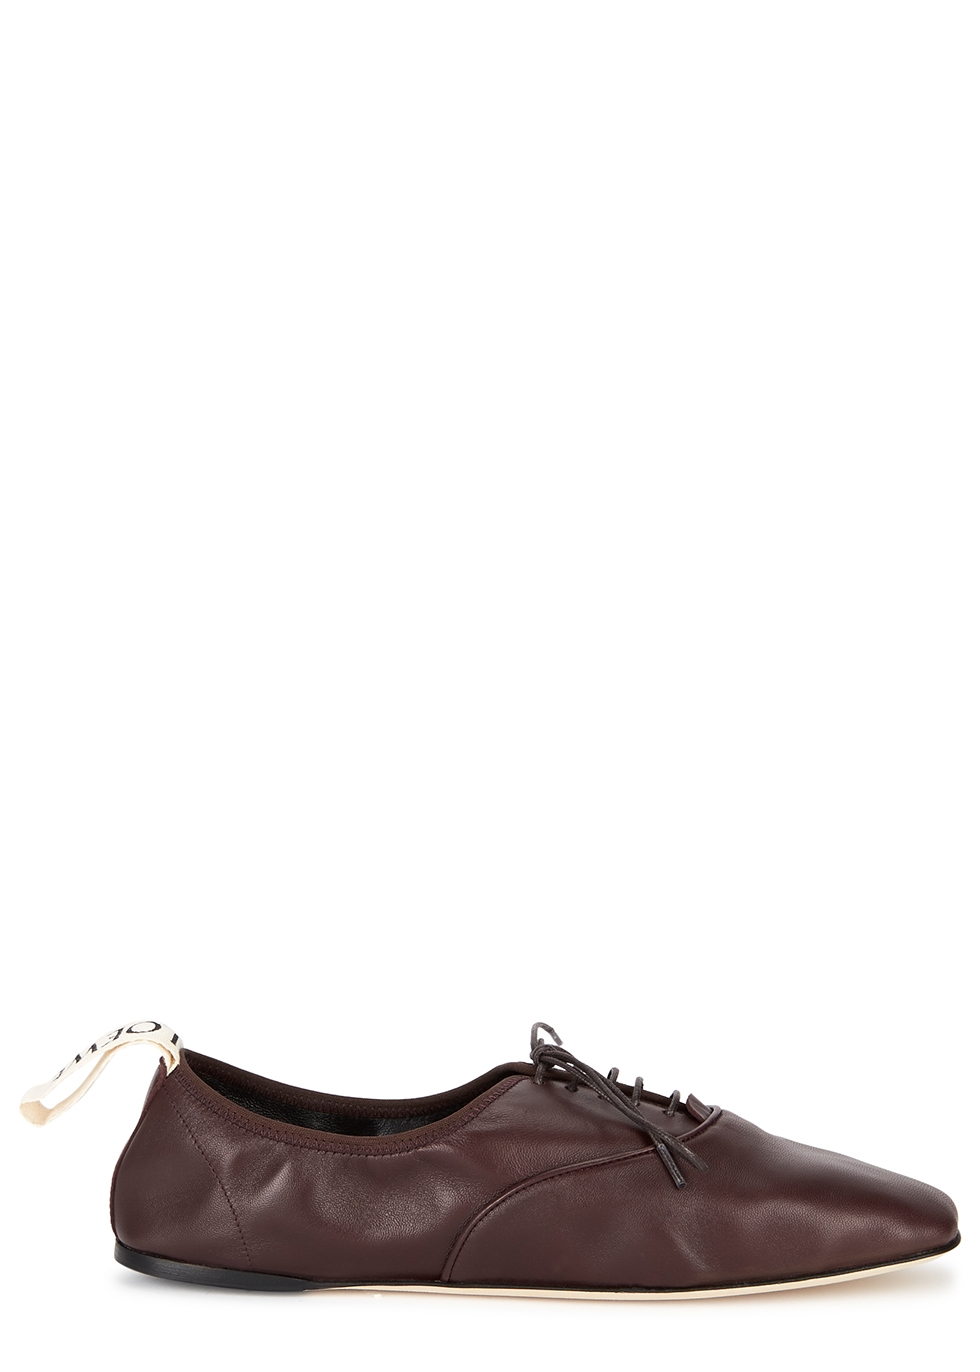 Loewe Burgundy leather Derby shoes